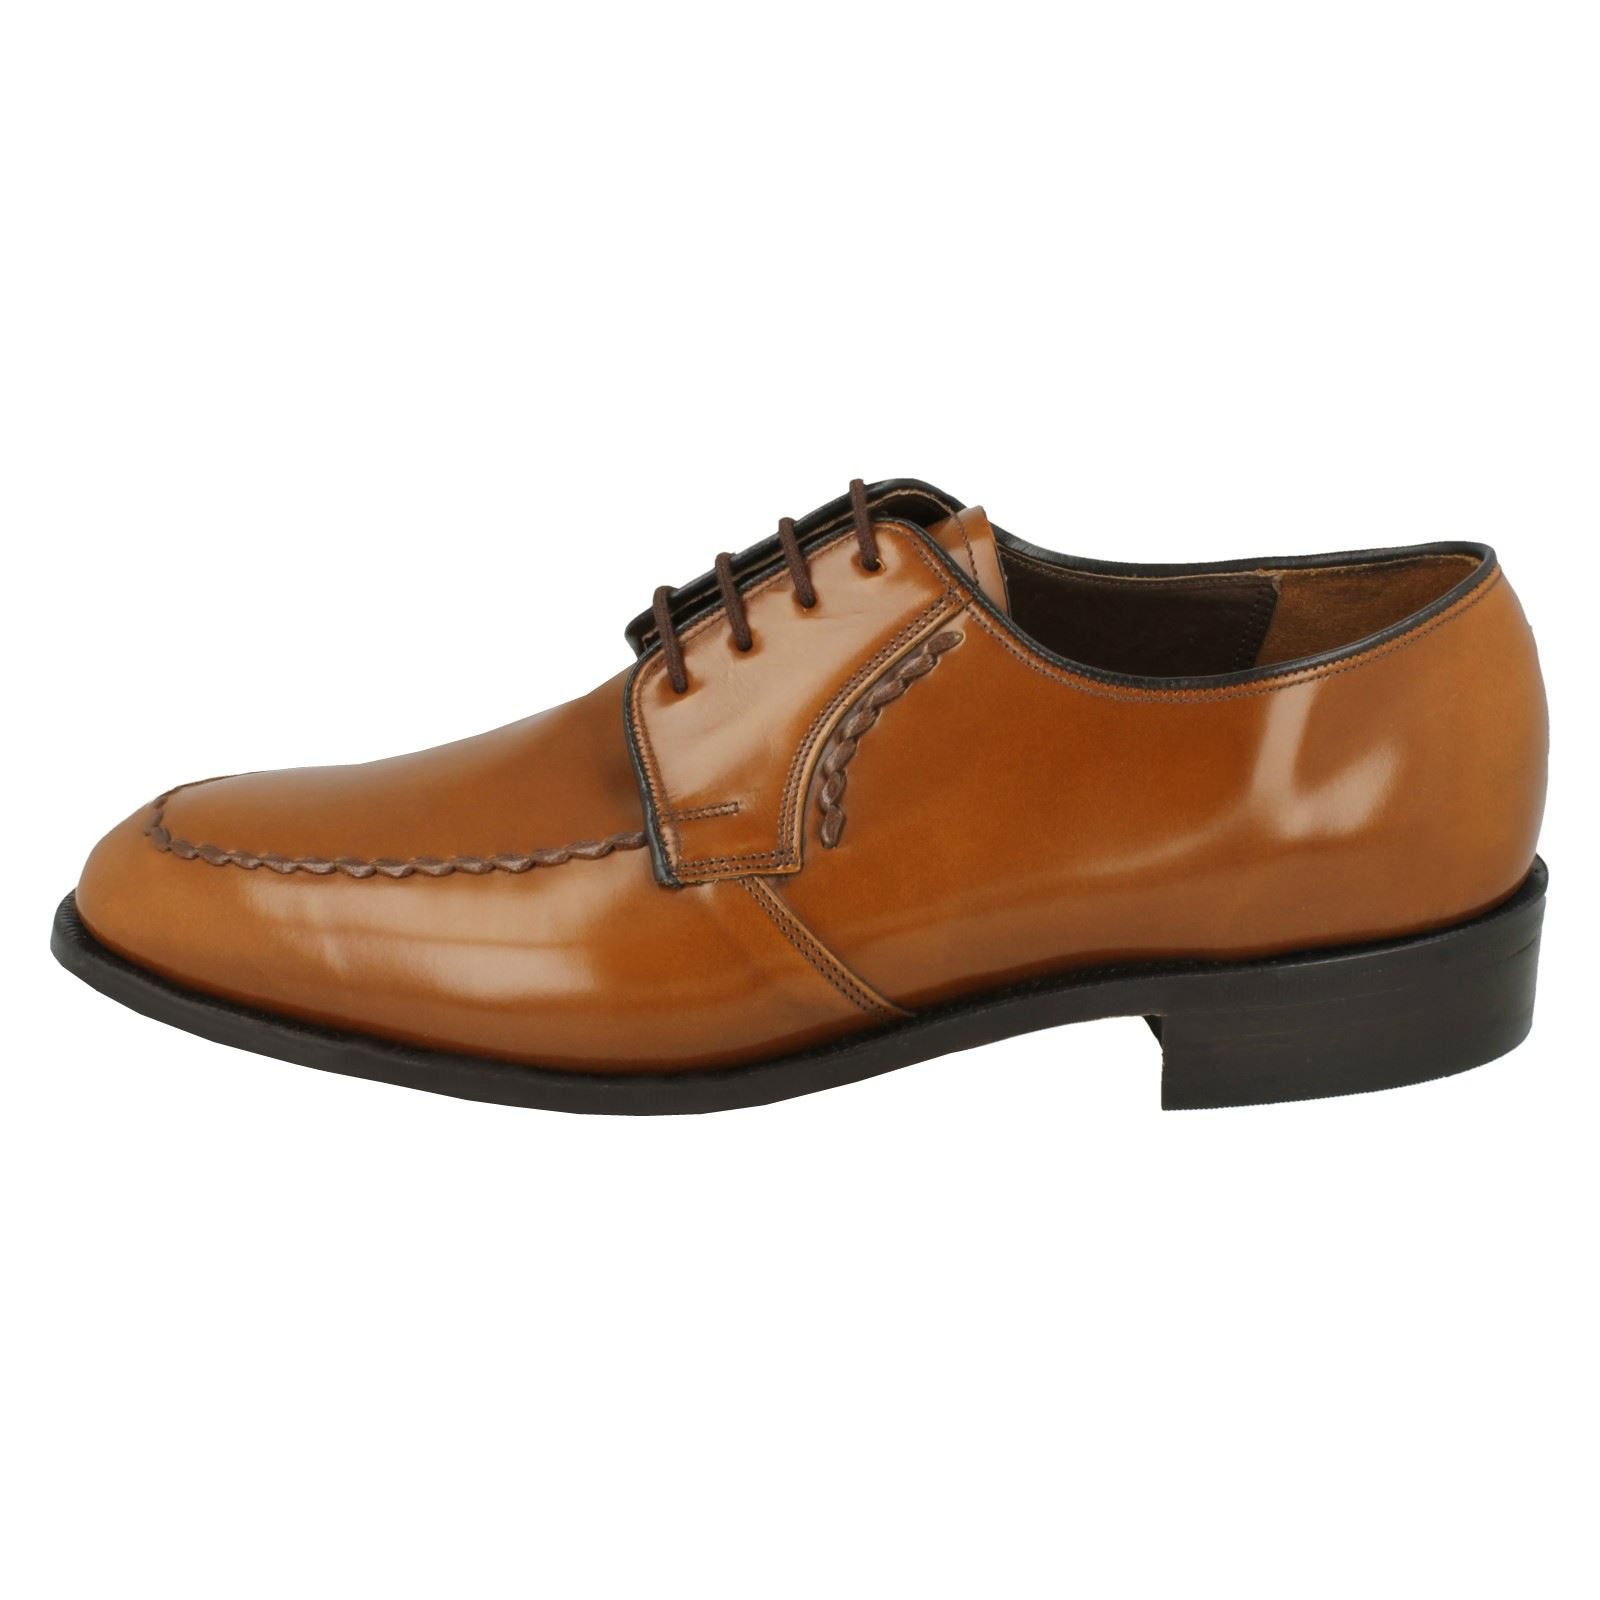 Hommes Chaussures Barker Habillées' ' Eaton OPkiZTXu